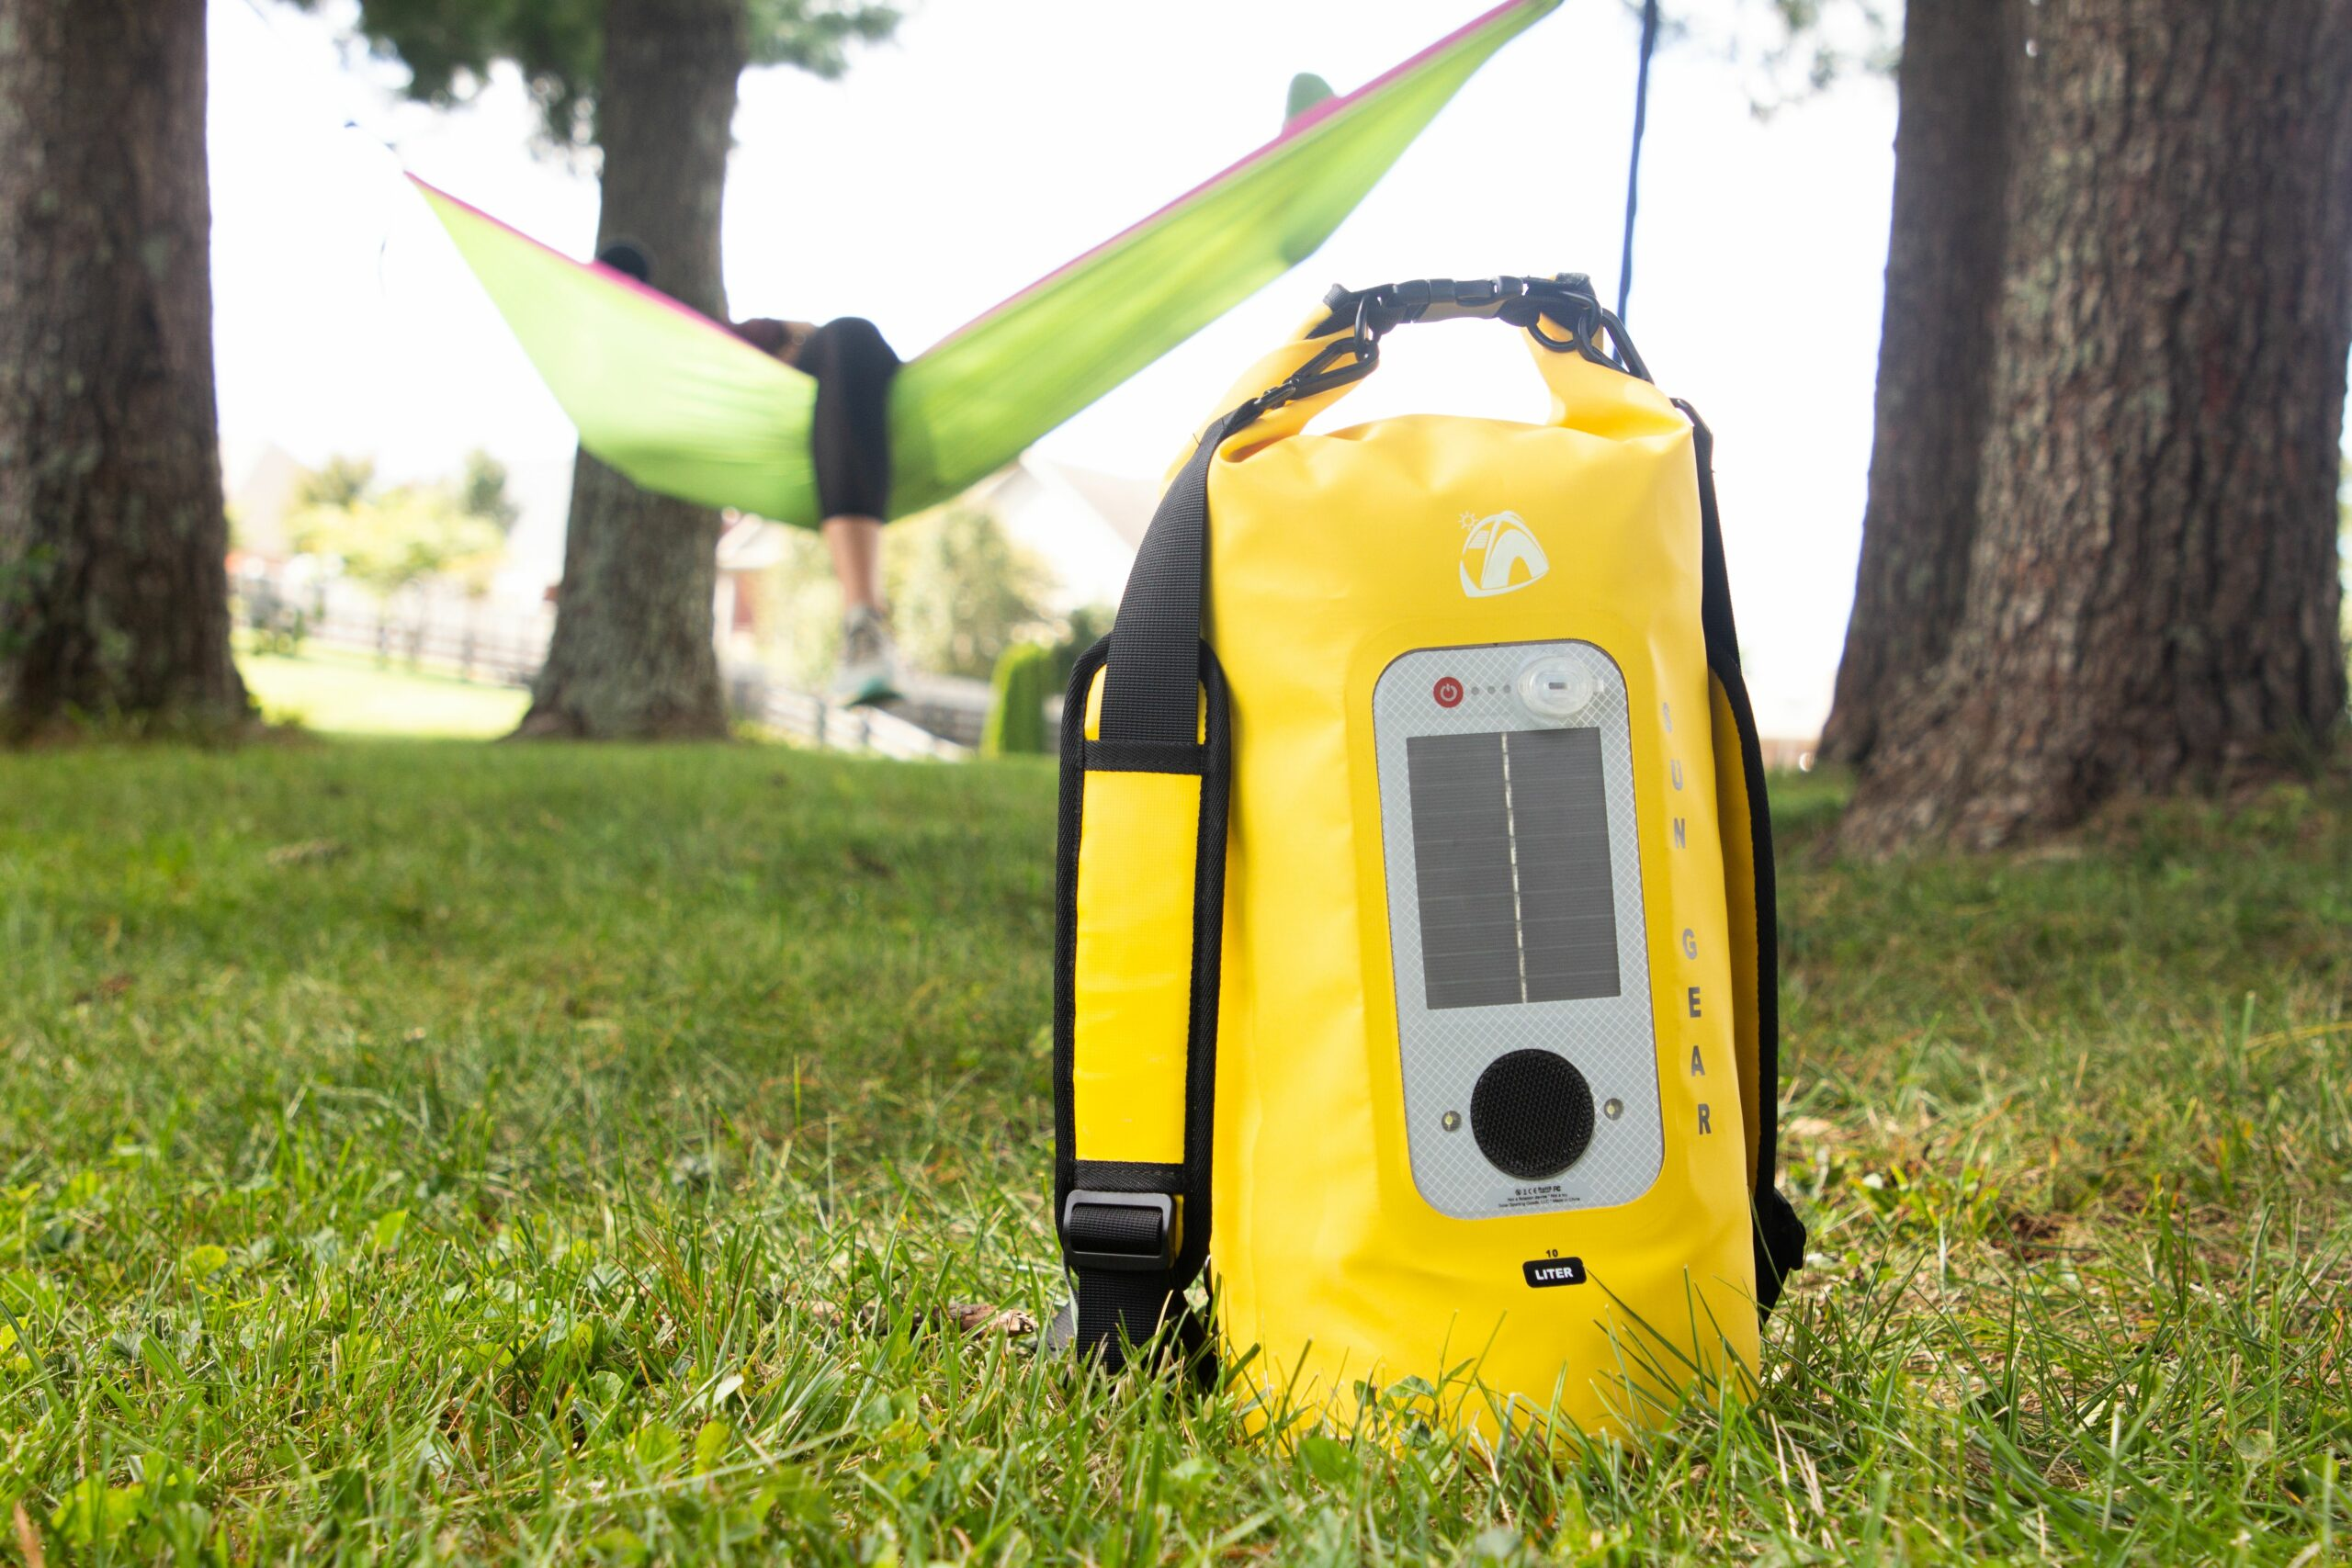 SUN GEAR Dry Bag Bluetooth Speaker